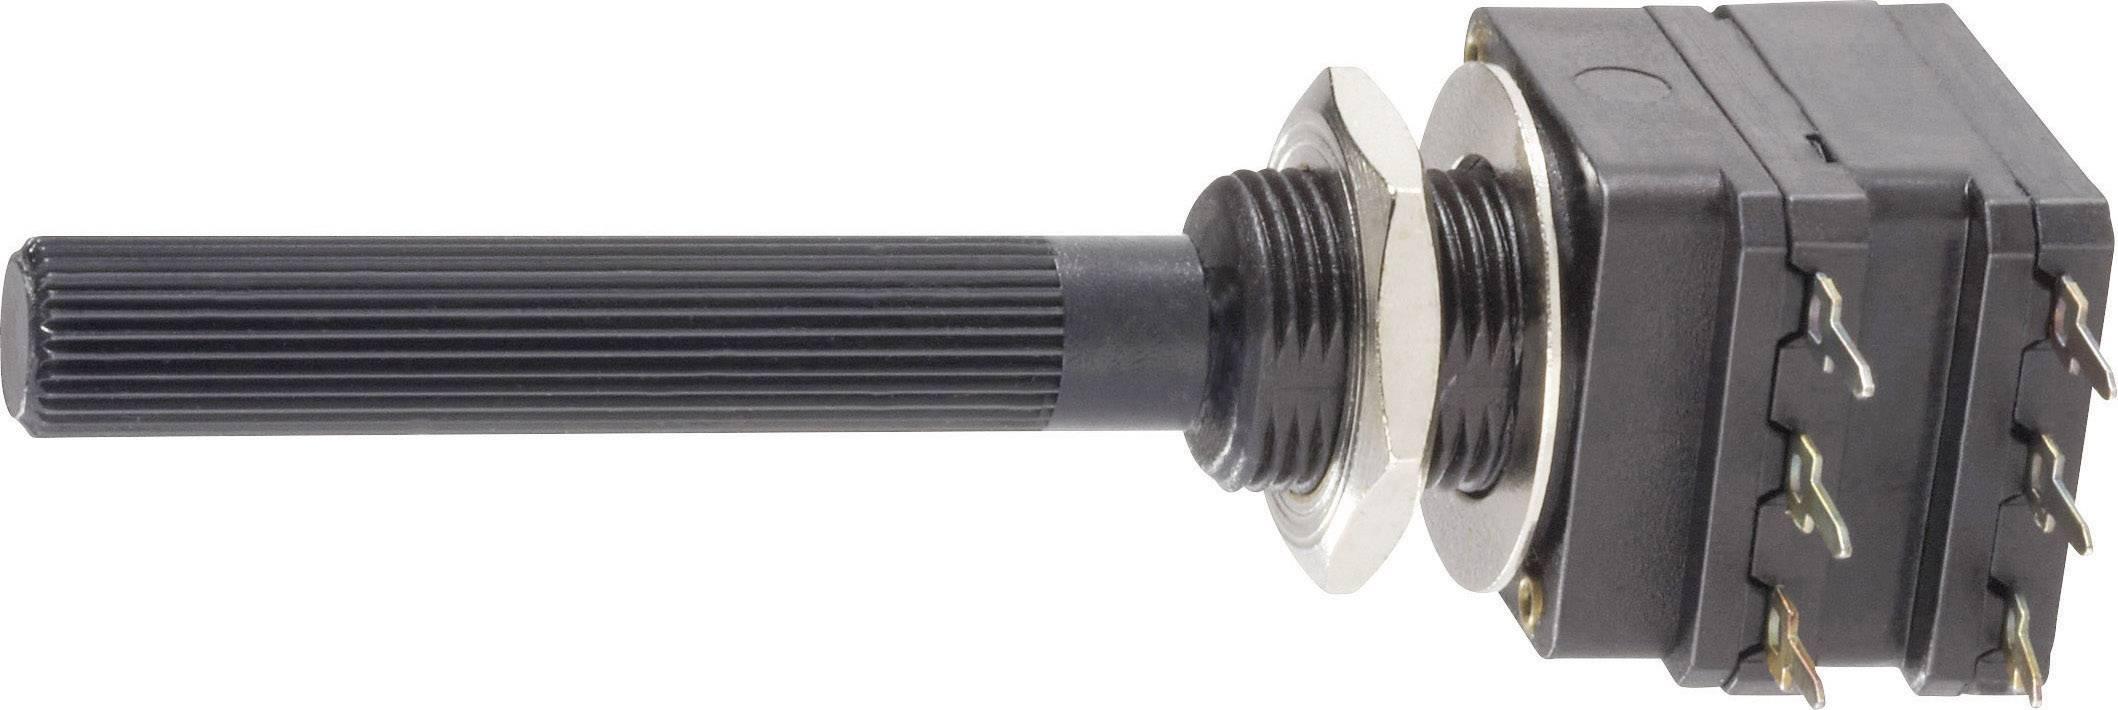 Otočný potenciometer stereo Piher PC16DH-10IP06105A2020MTA PC16DH-10IP06105A2020MTA, 0.2 W, 1 MOhm, 1 ks